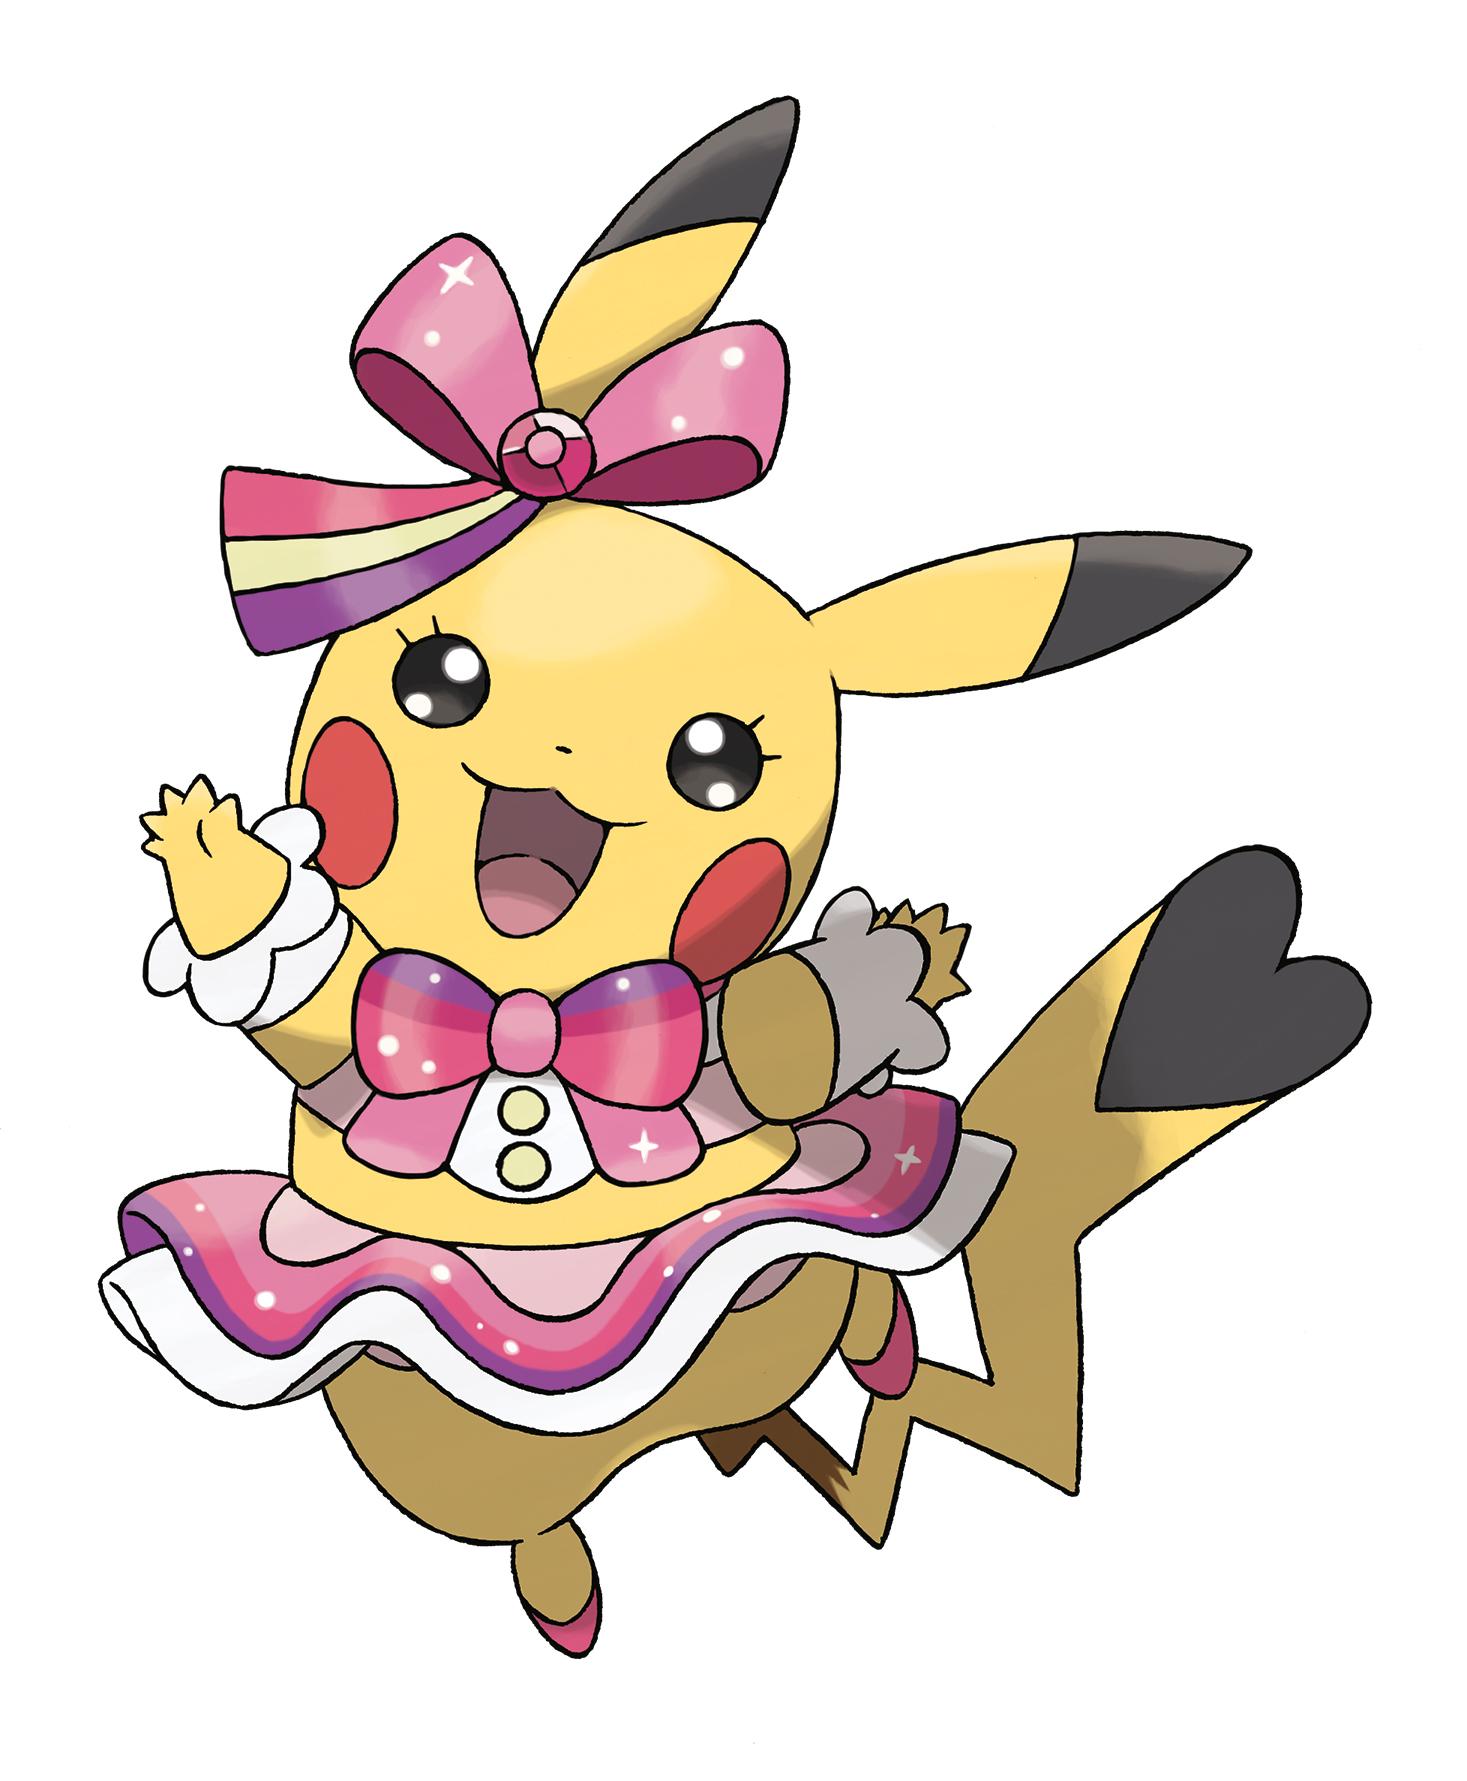 Le Pikachu Cosplayeur | Pokémon France